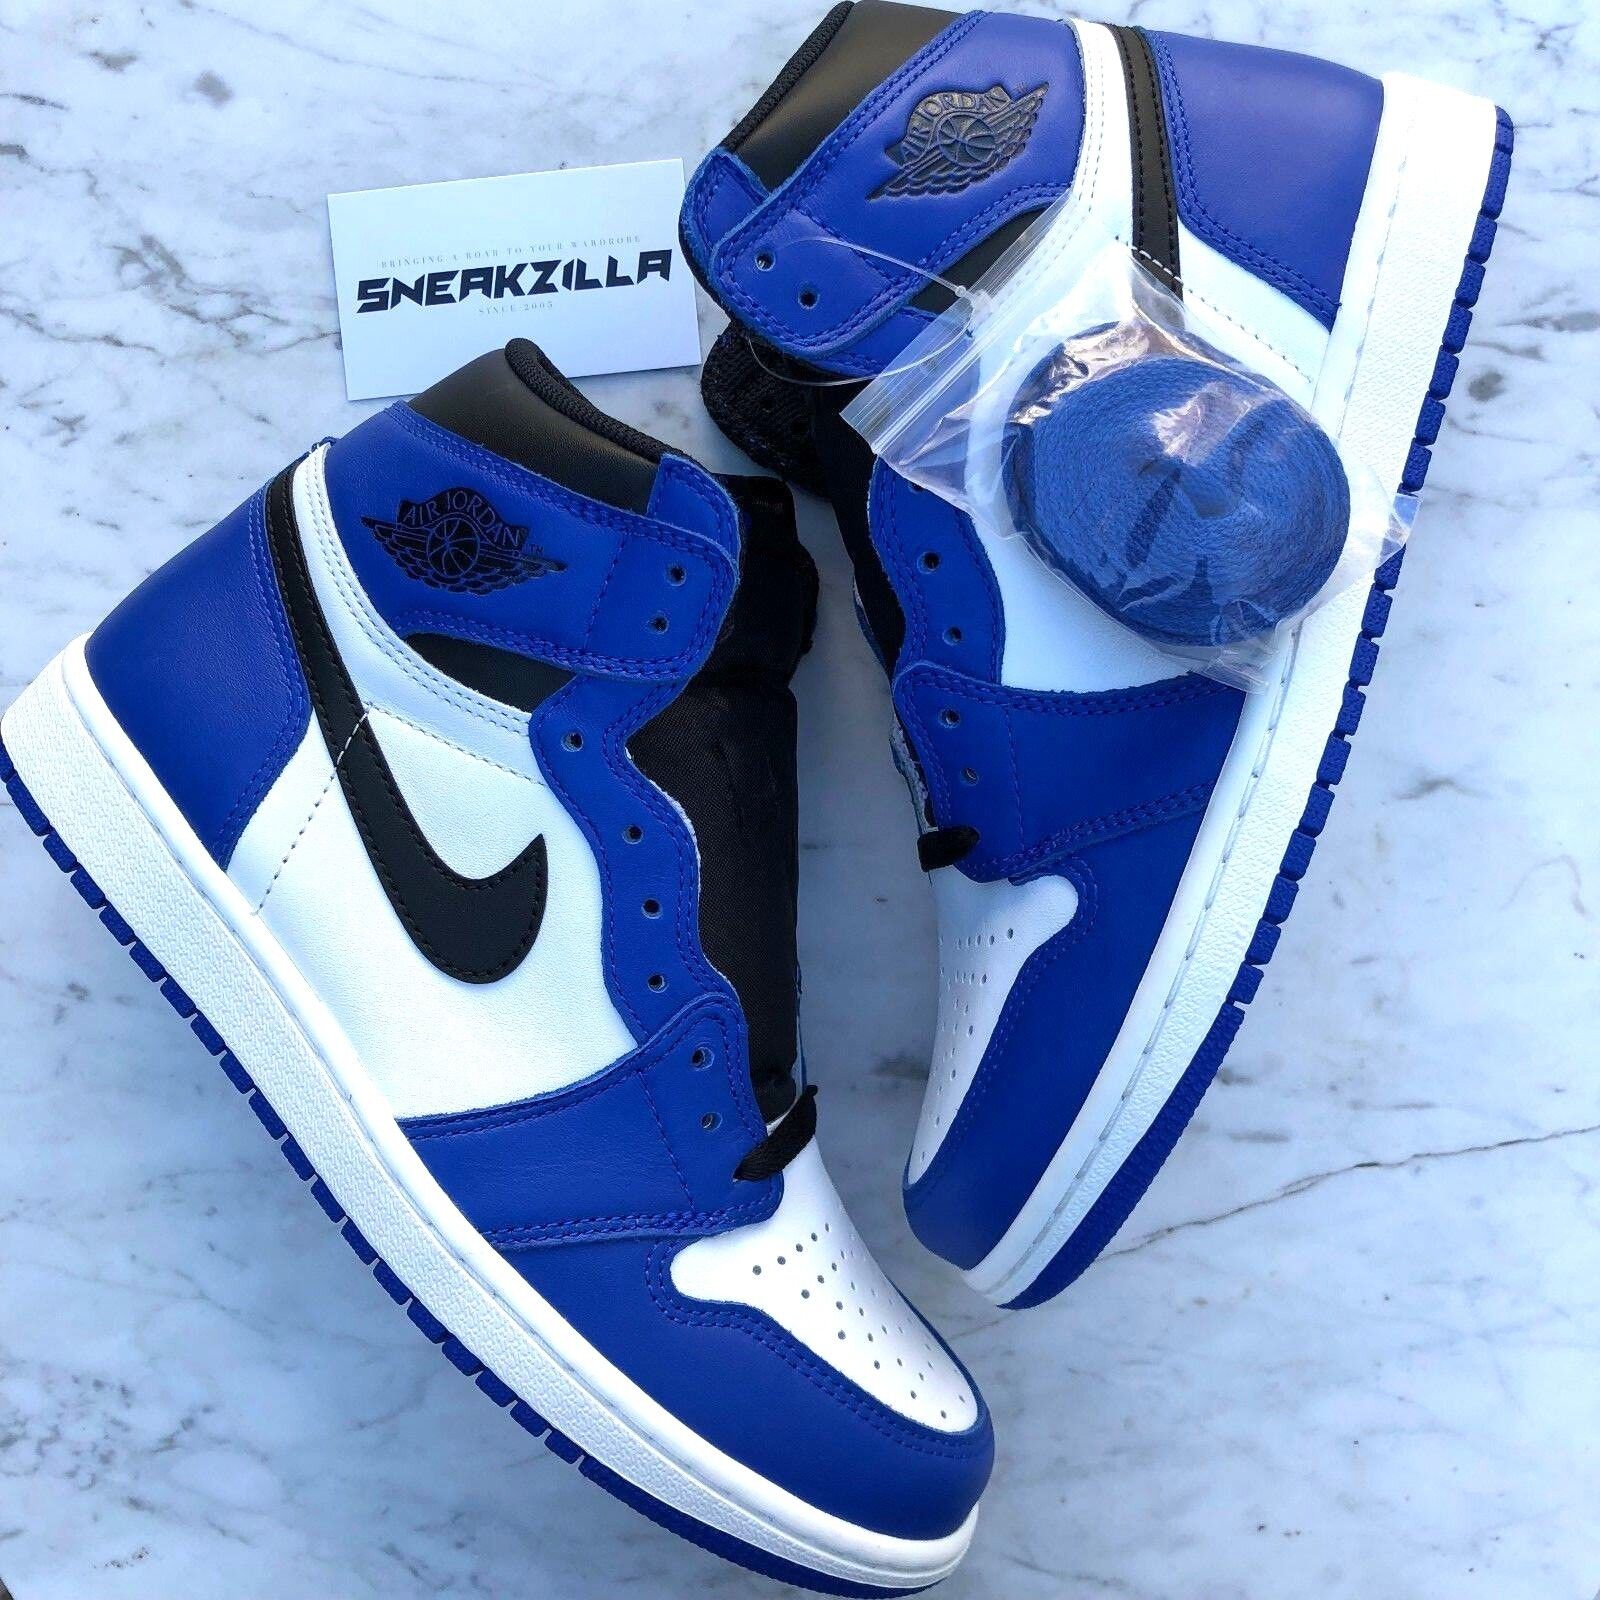 Nike Air Jordan Retro I 1 High OG GAME ROYAL White Blue 555088-403 Sz 4y-13